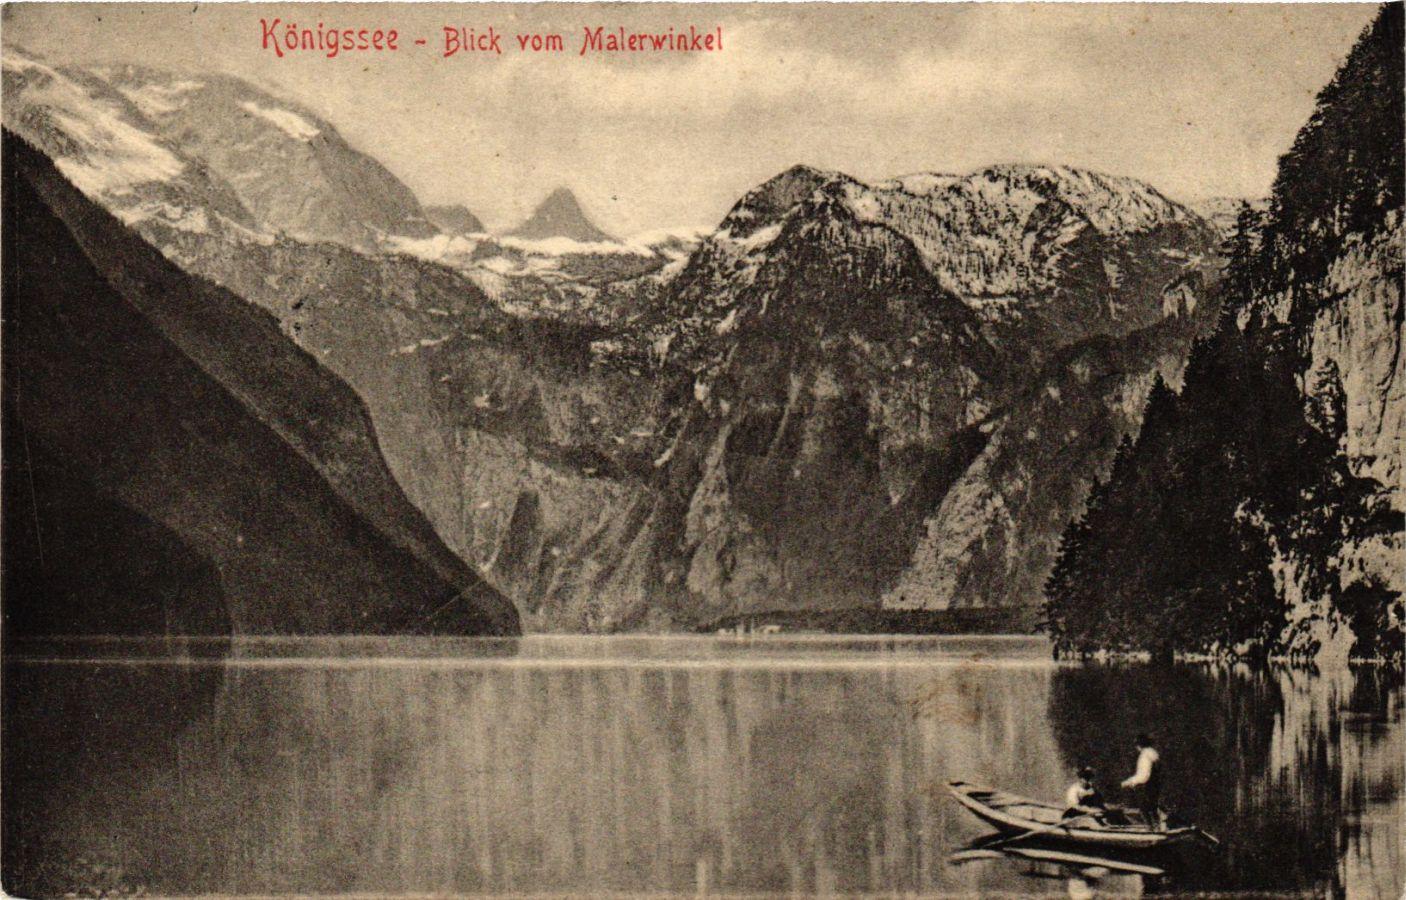 CPA-AK-Konigssee-Blick-vom-Malerwinkel-GERMANY-879306